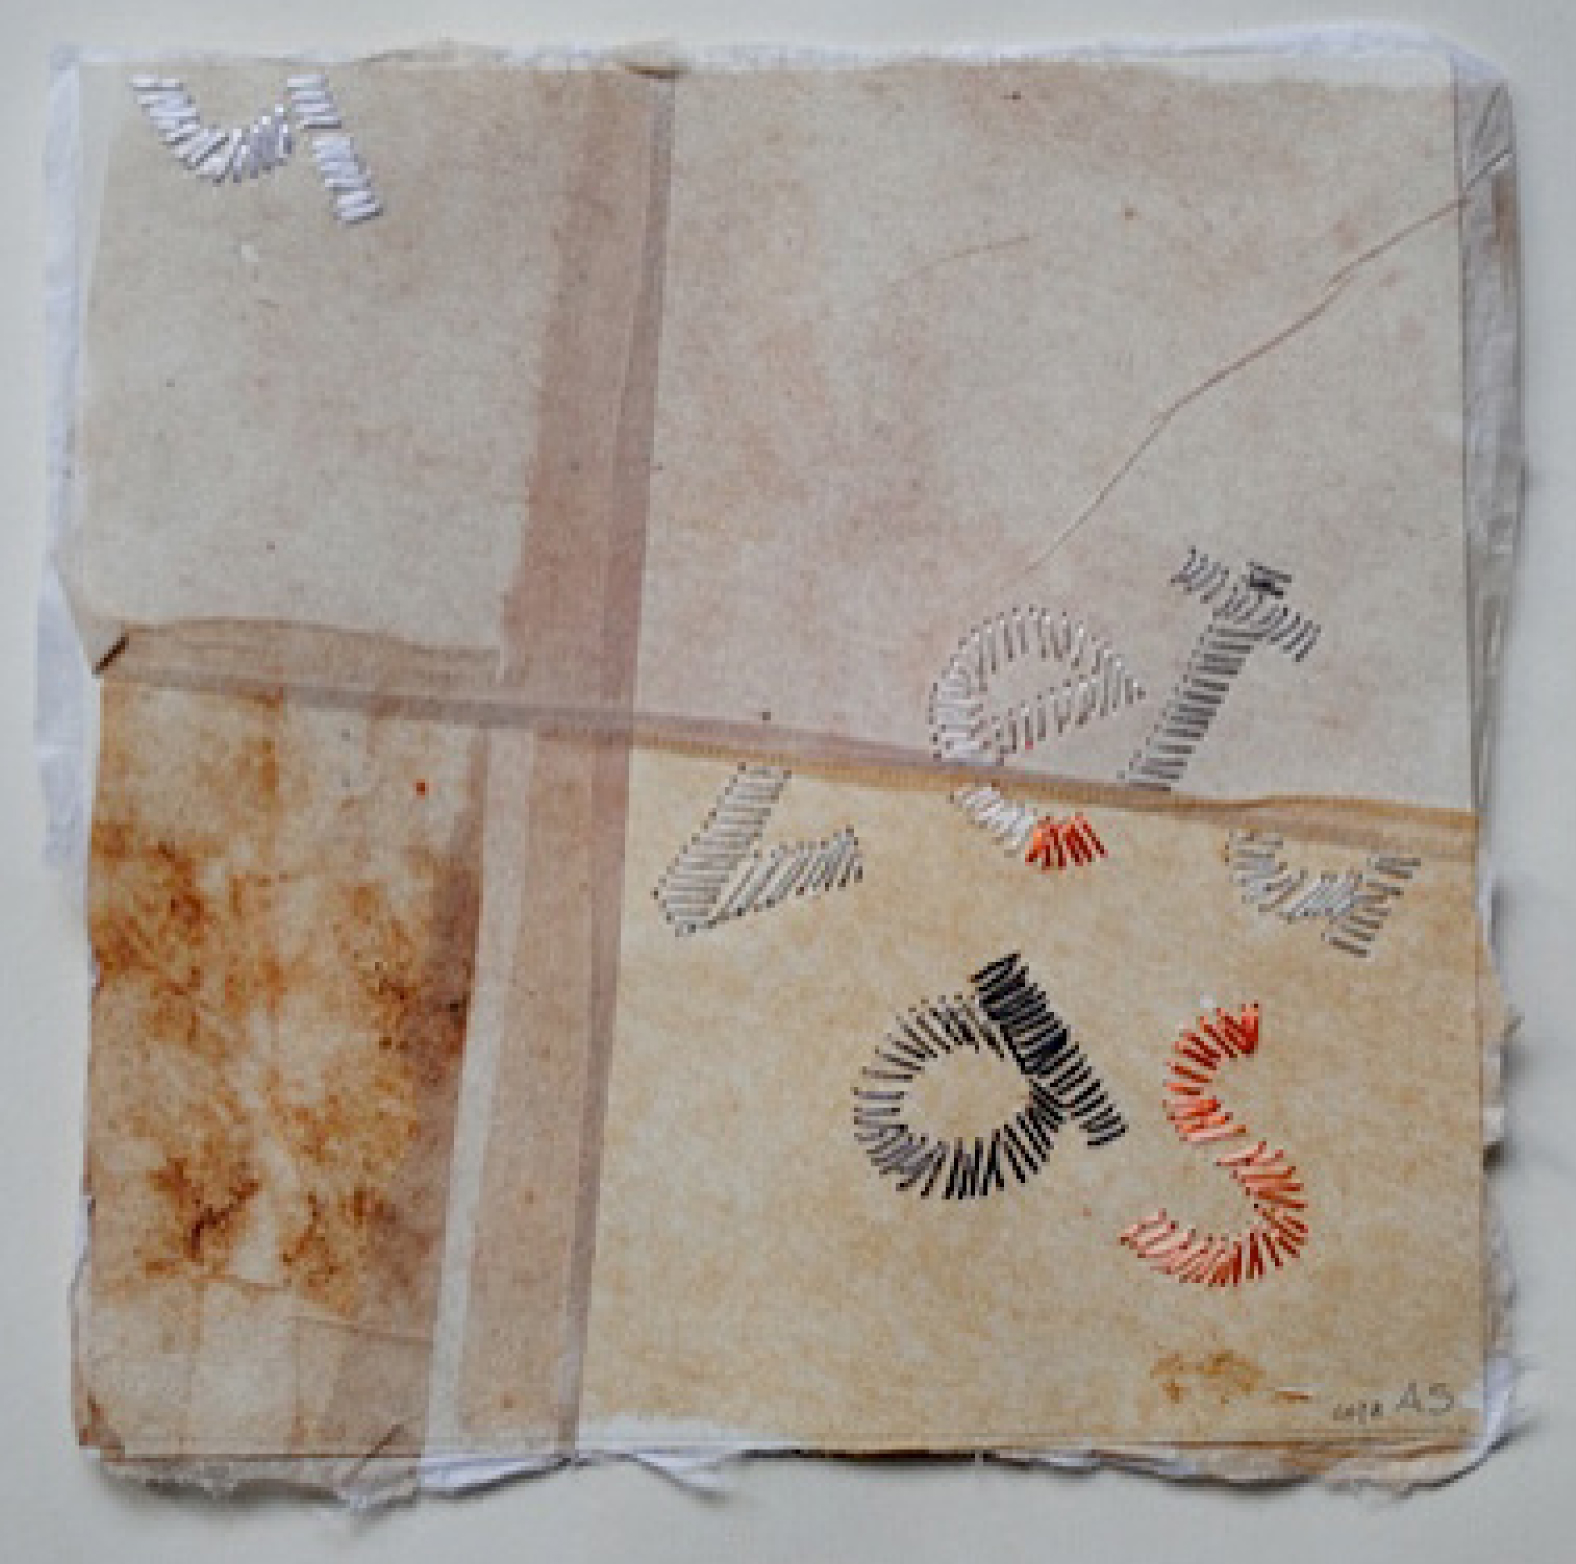 31 | Annerose Schulze | Flüsterblätter II Blatt 1 | Collage/Japanpiere/Seidenstick | 15 x 15 cm | Kunstlotterie